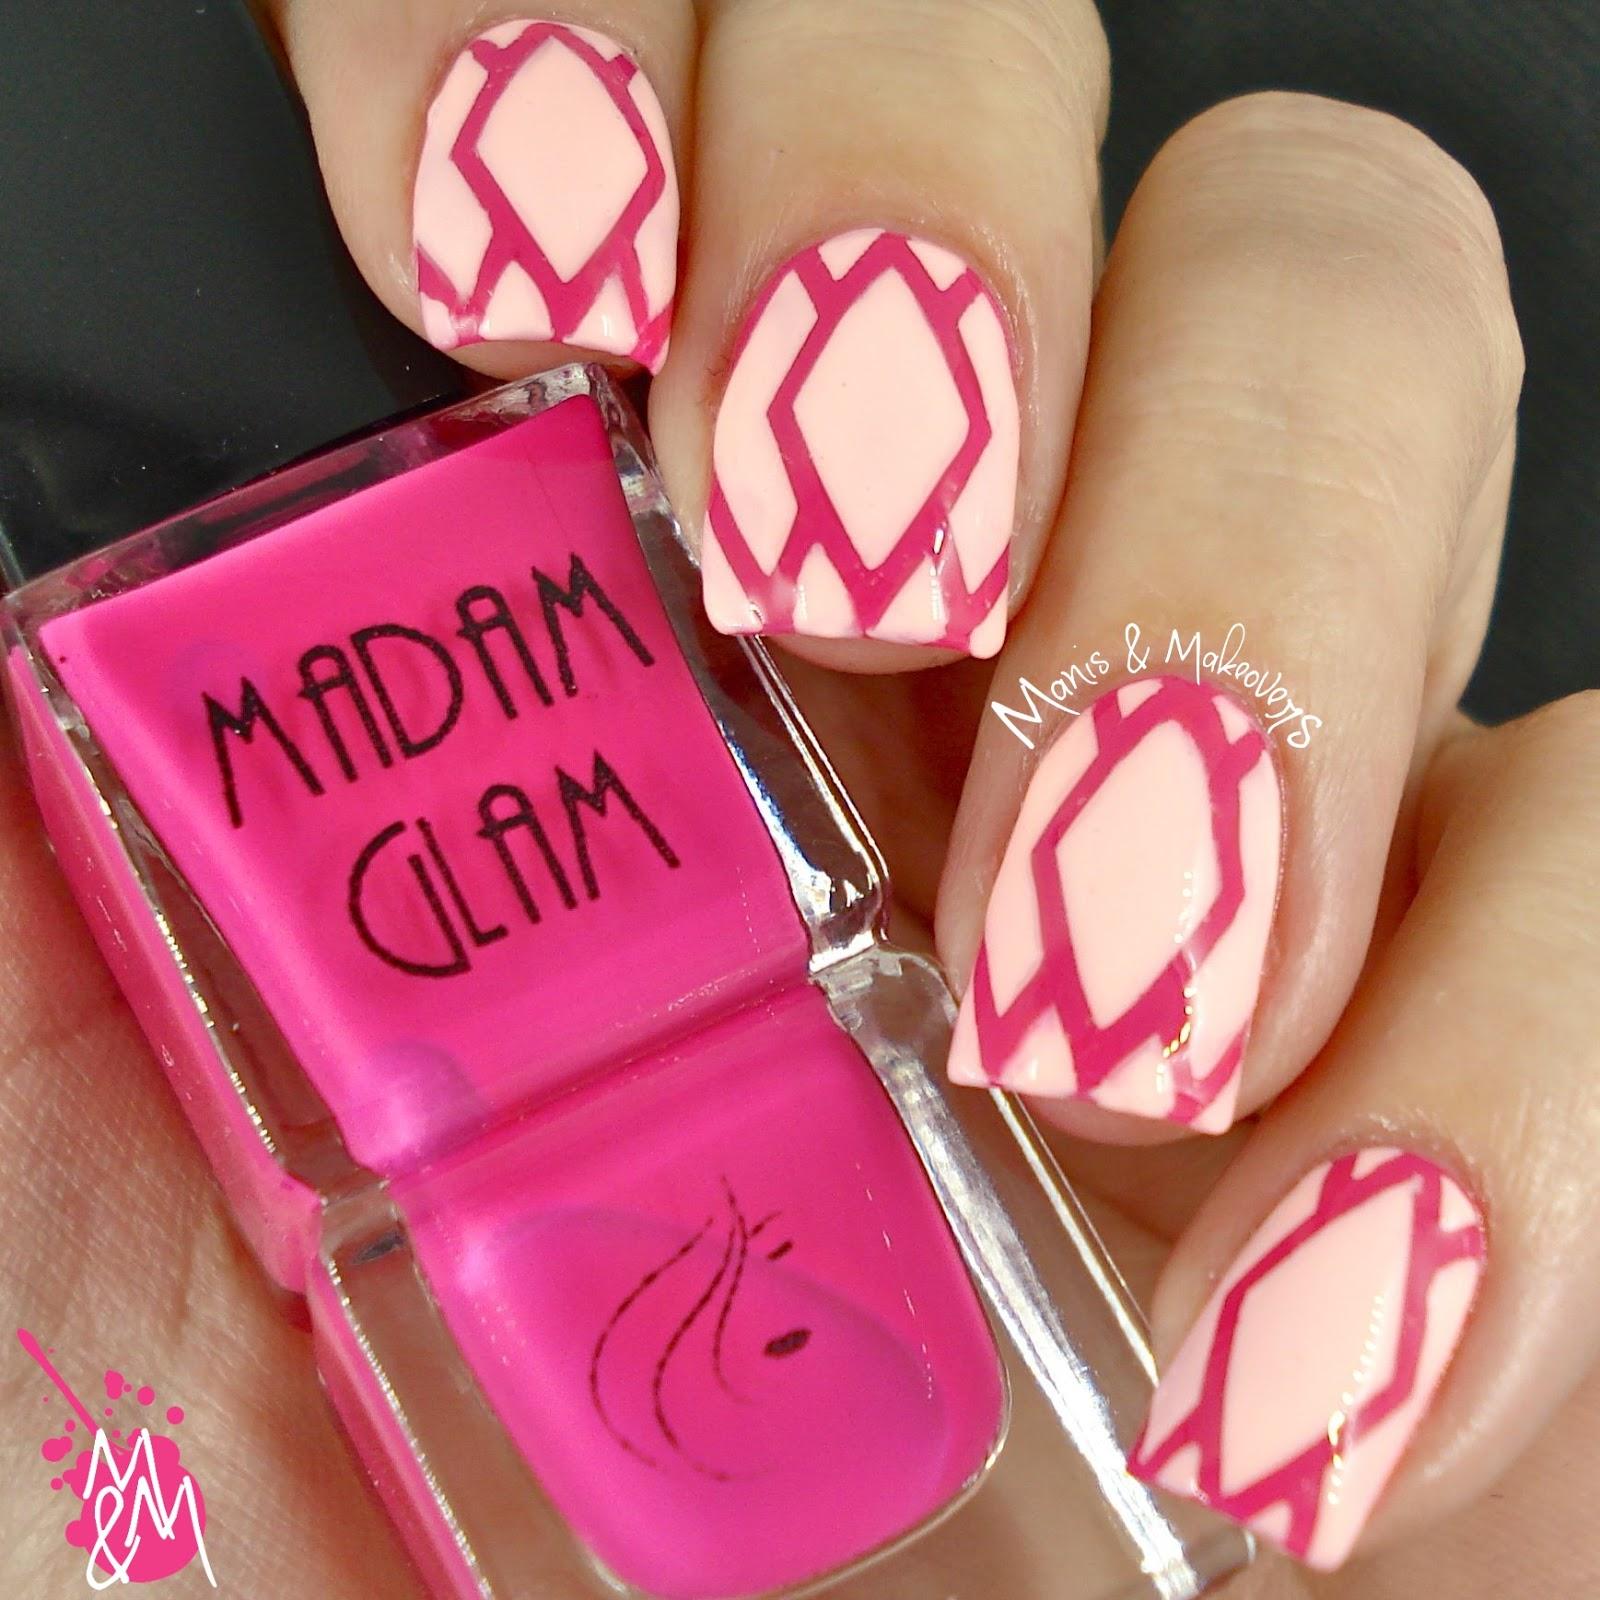 Manis Makeovers Madam Glam Vinyl Quickies Nail Art